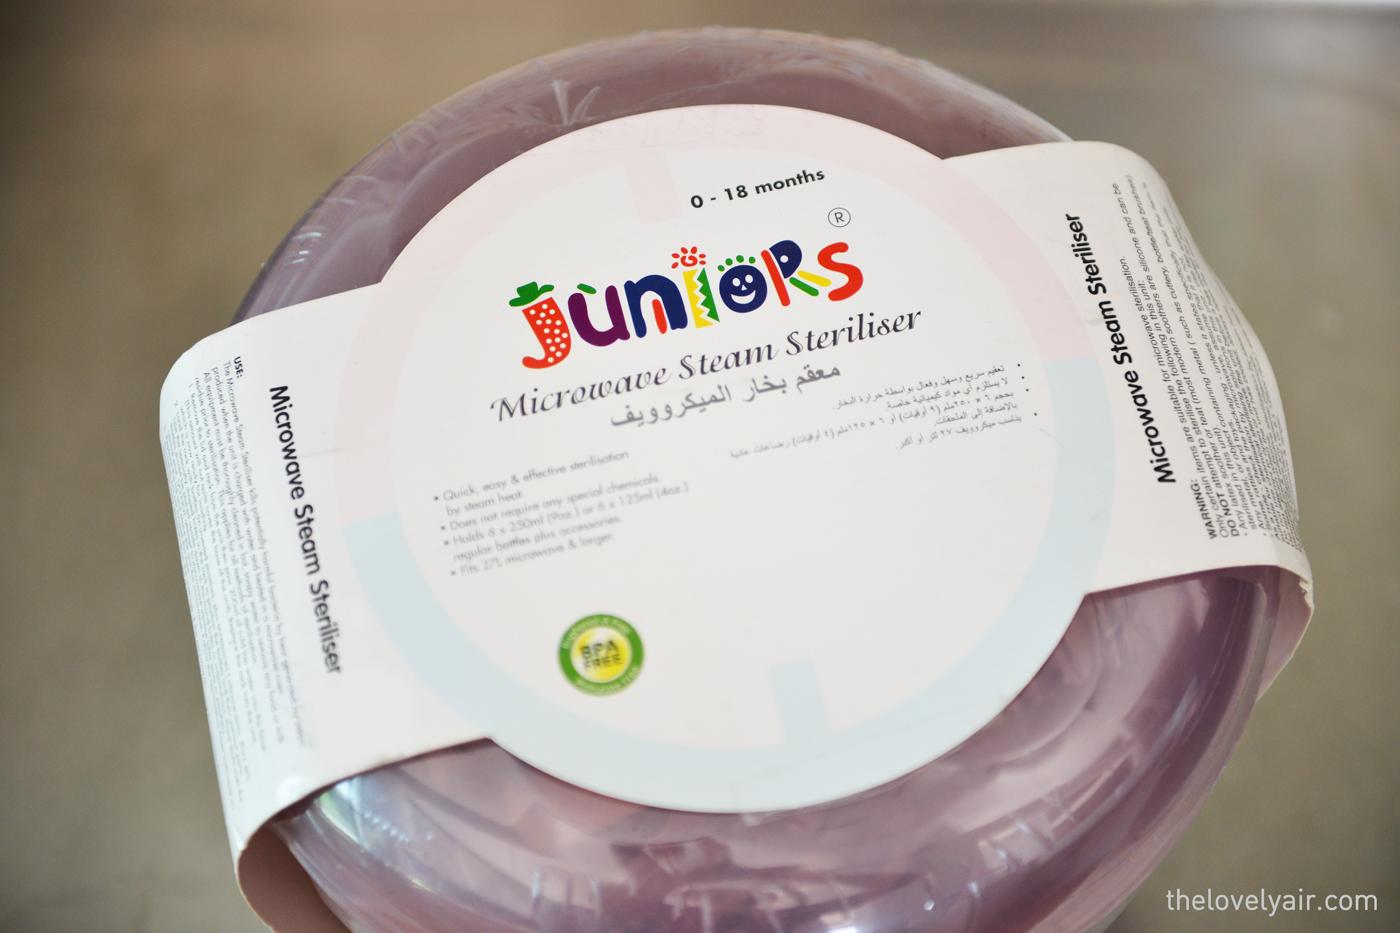 juniors-microwave-steam-steriliser-babyshop-1